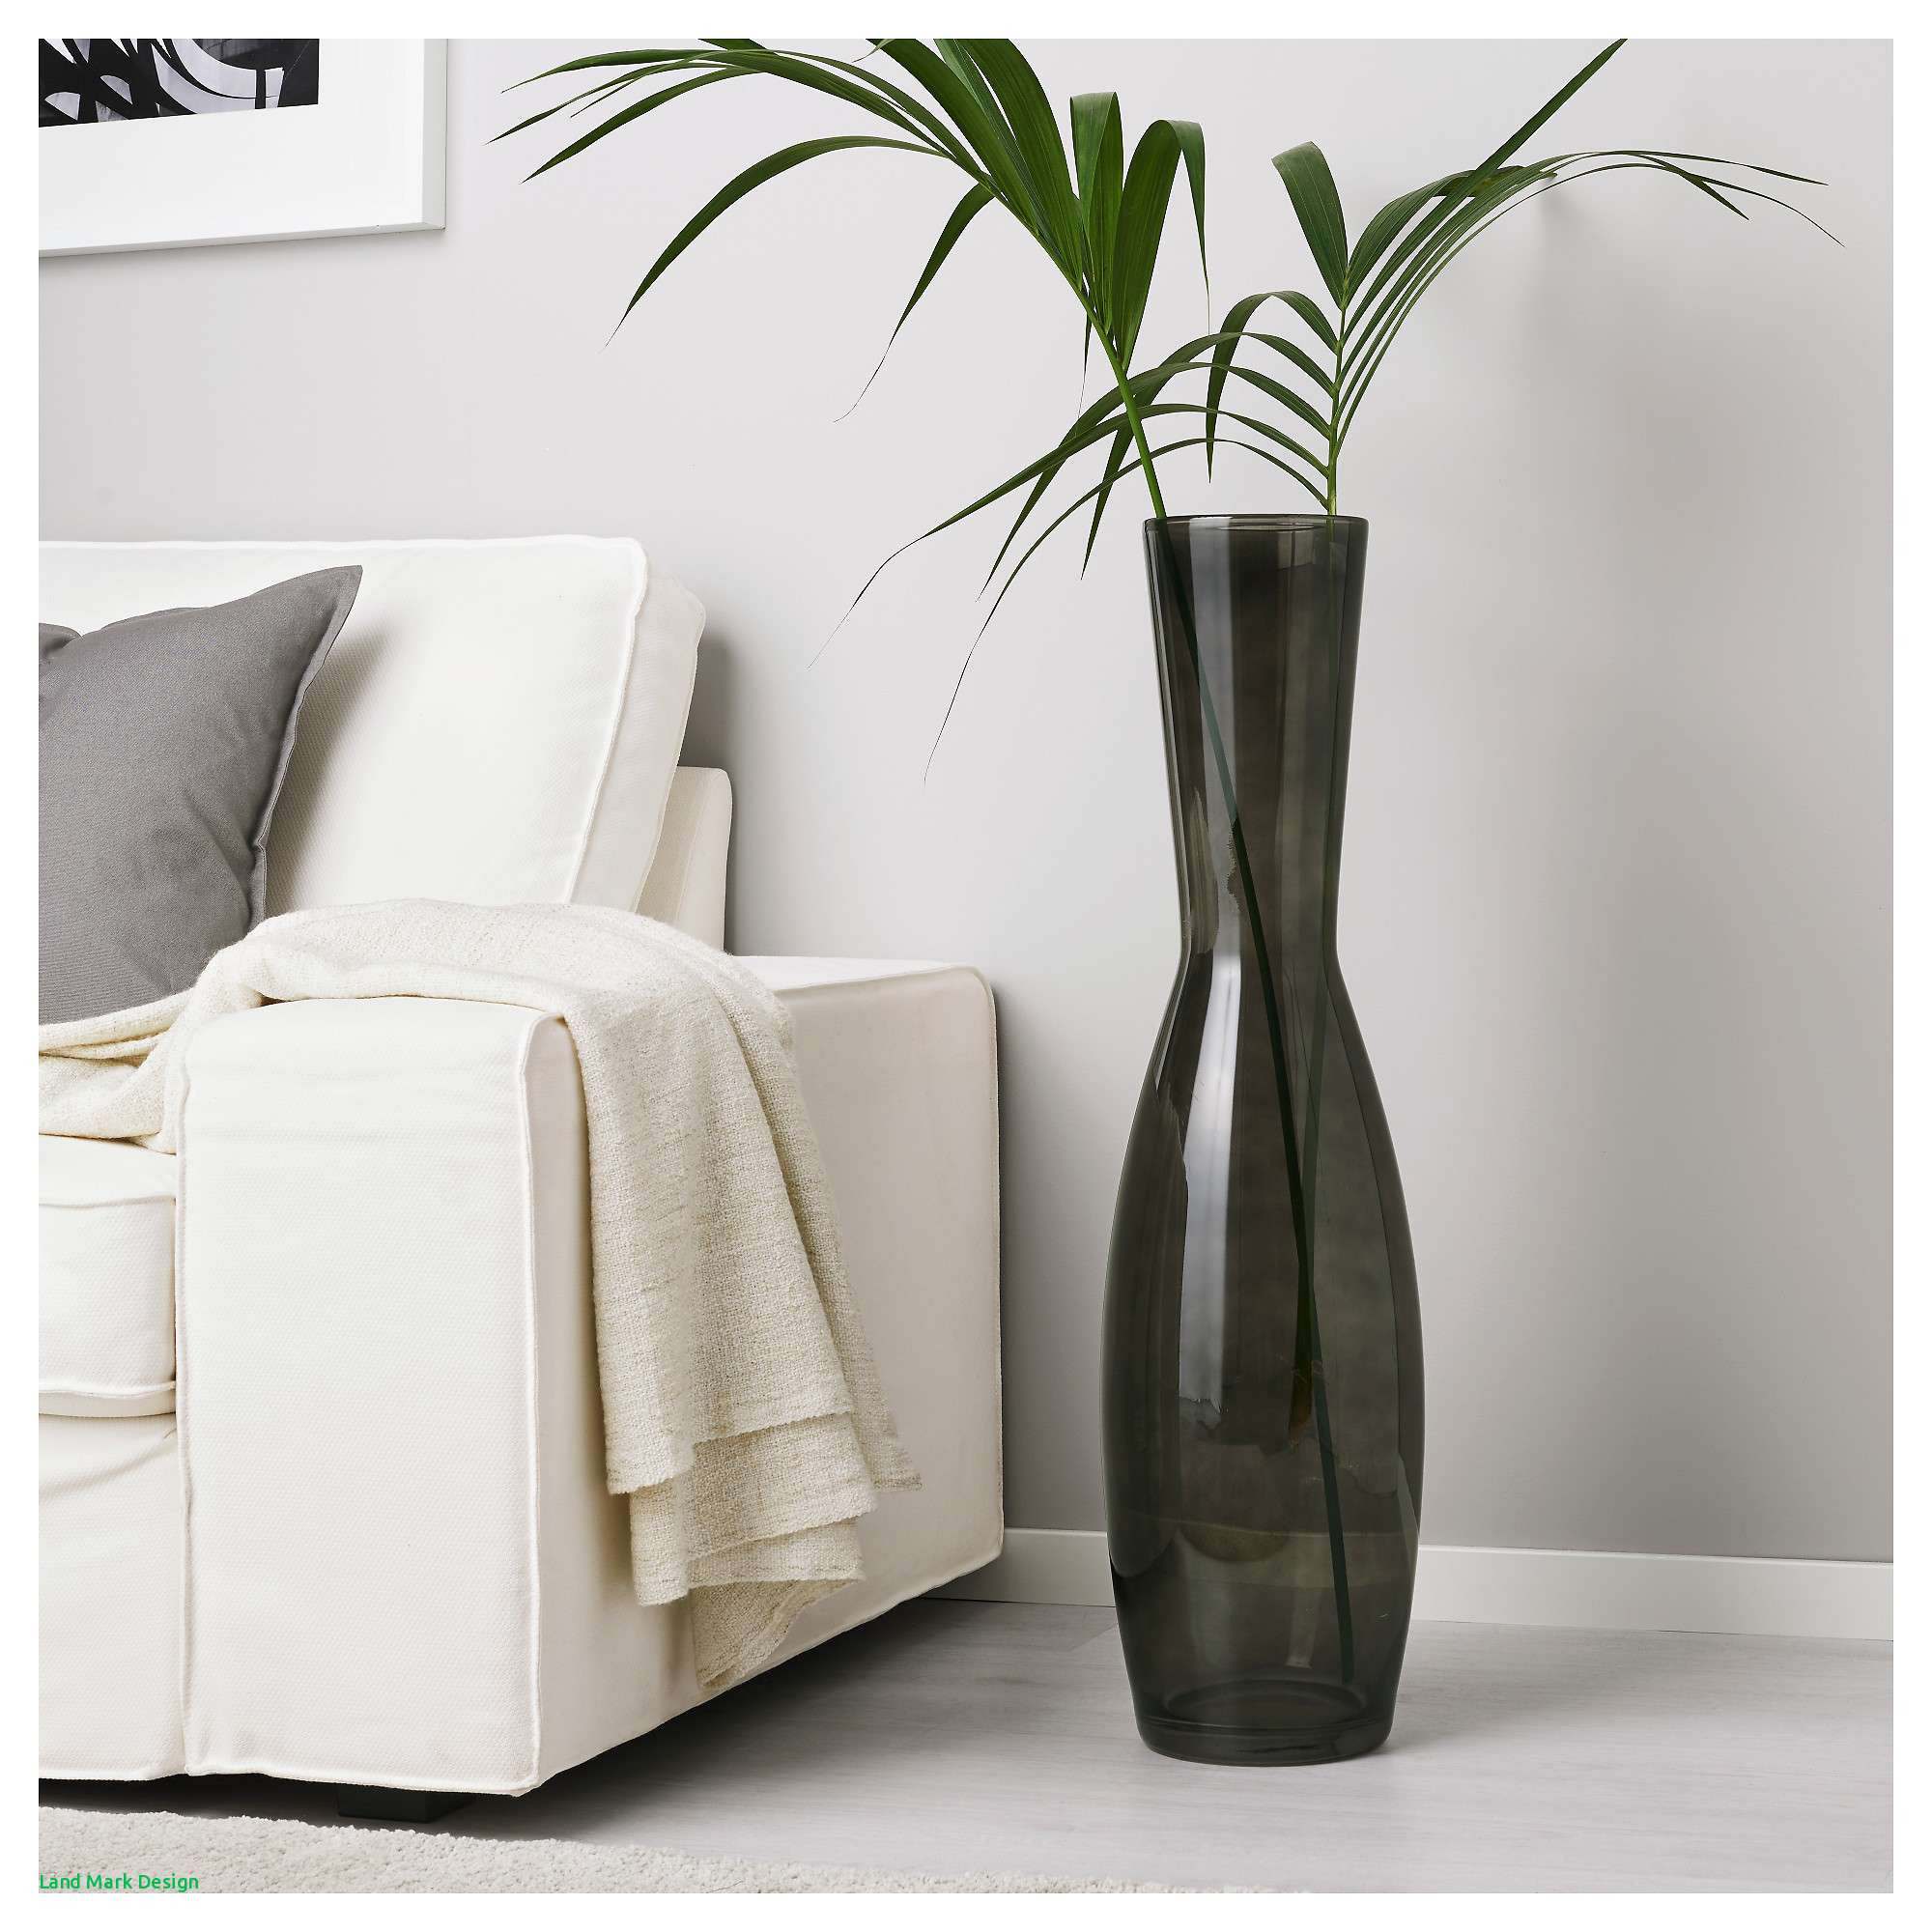 matte green vase of large white vases photos living room glass vases fresh clear vase 0d within large white vases image floor vases of large white vases photos living room glass vases fresh